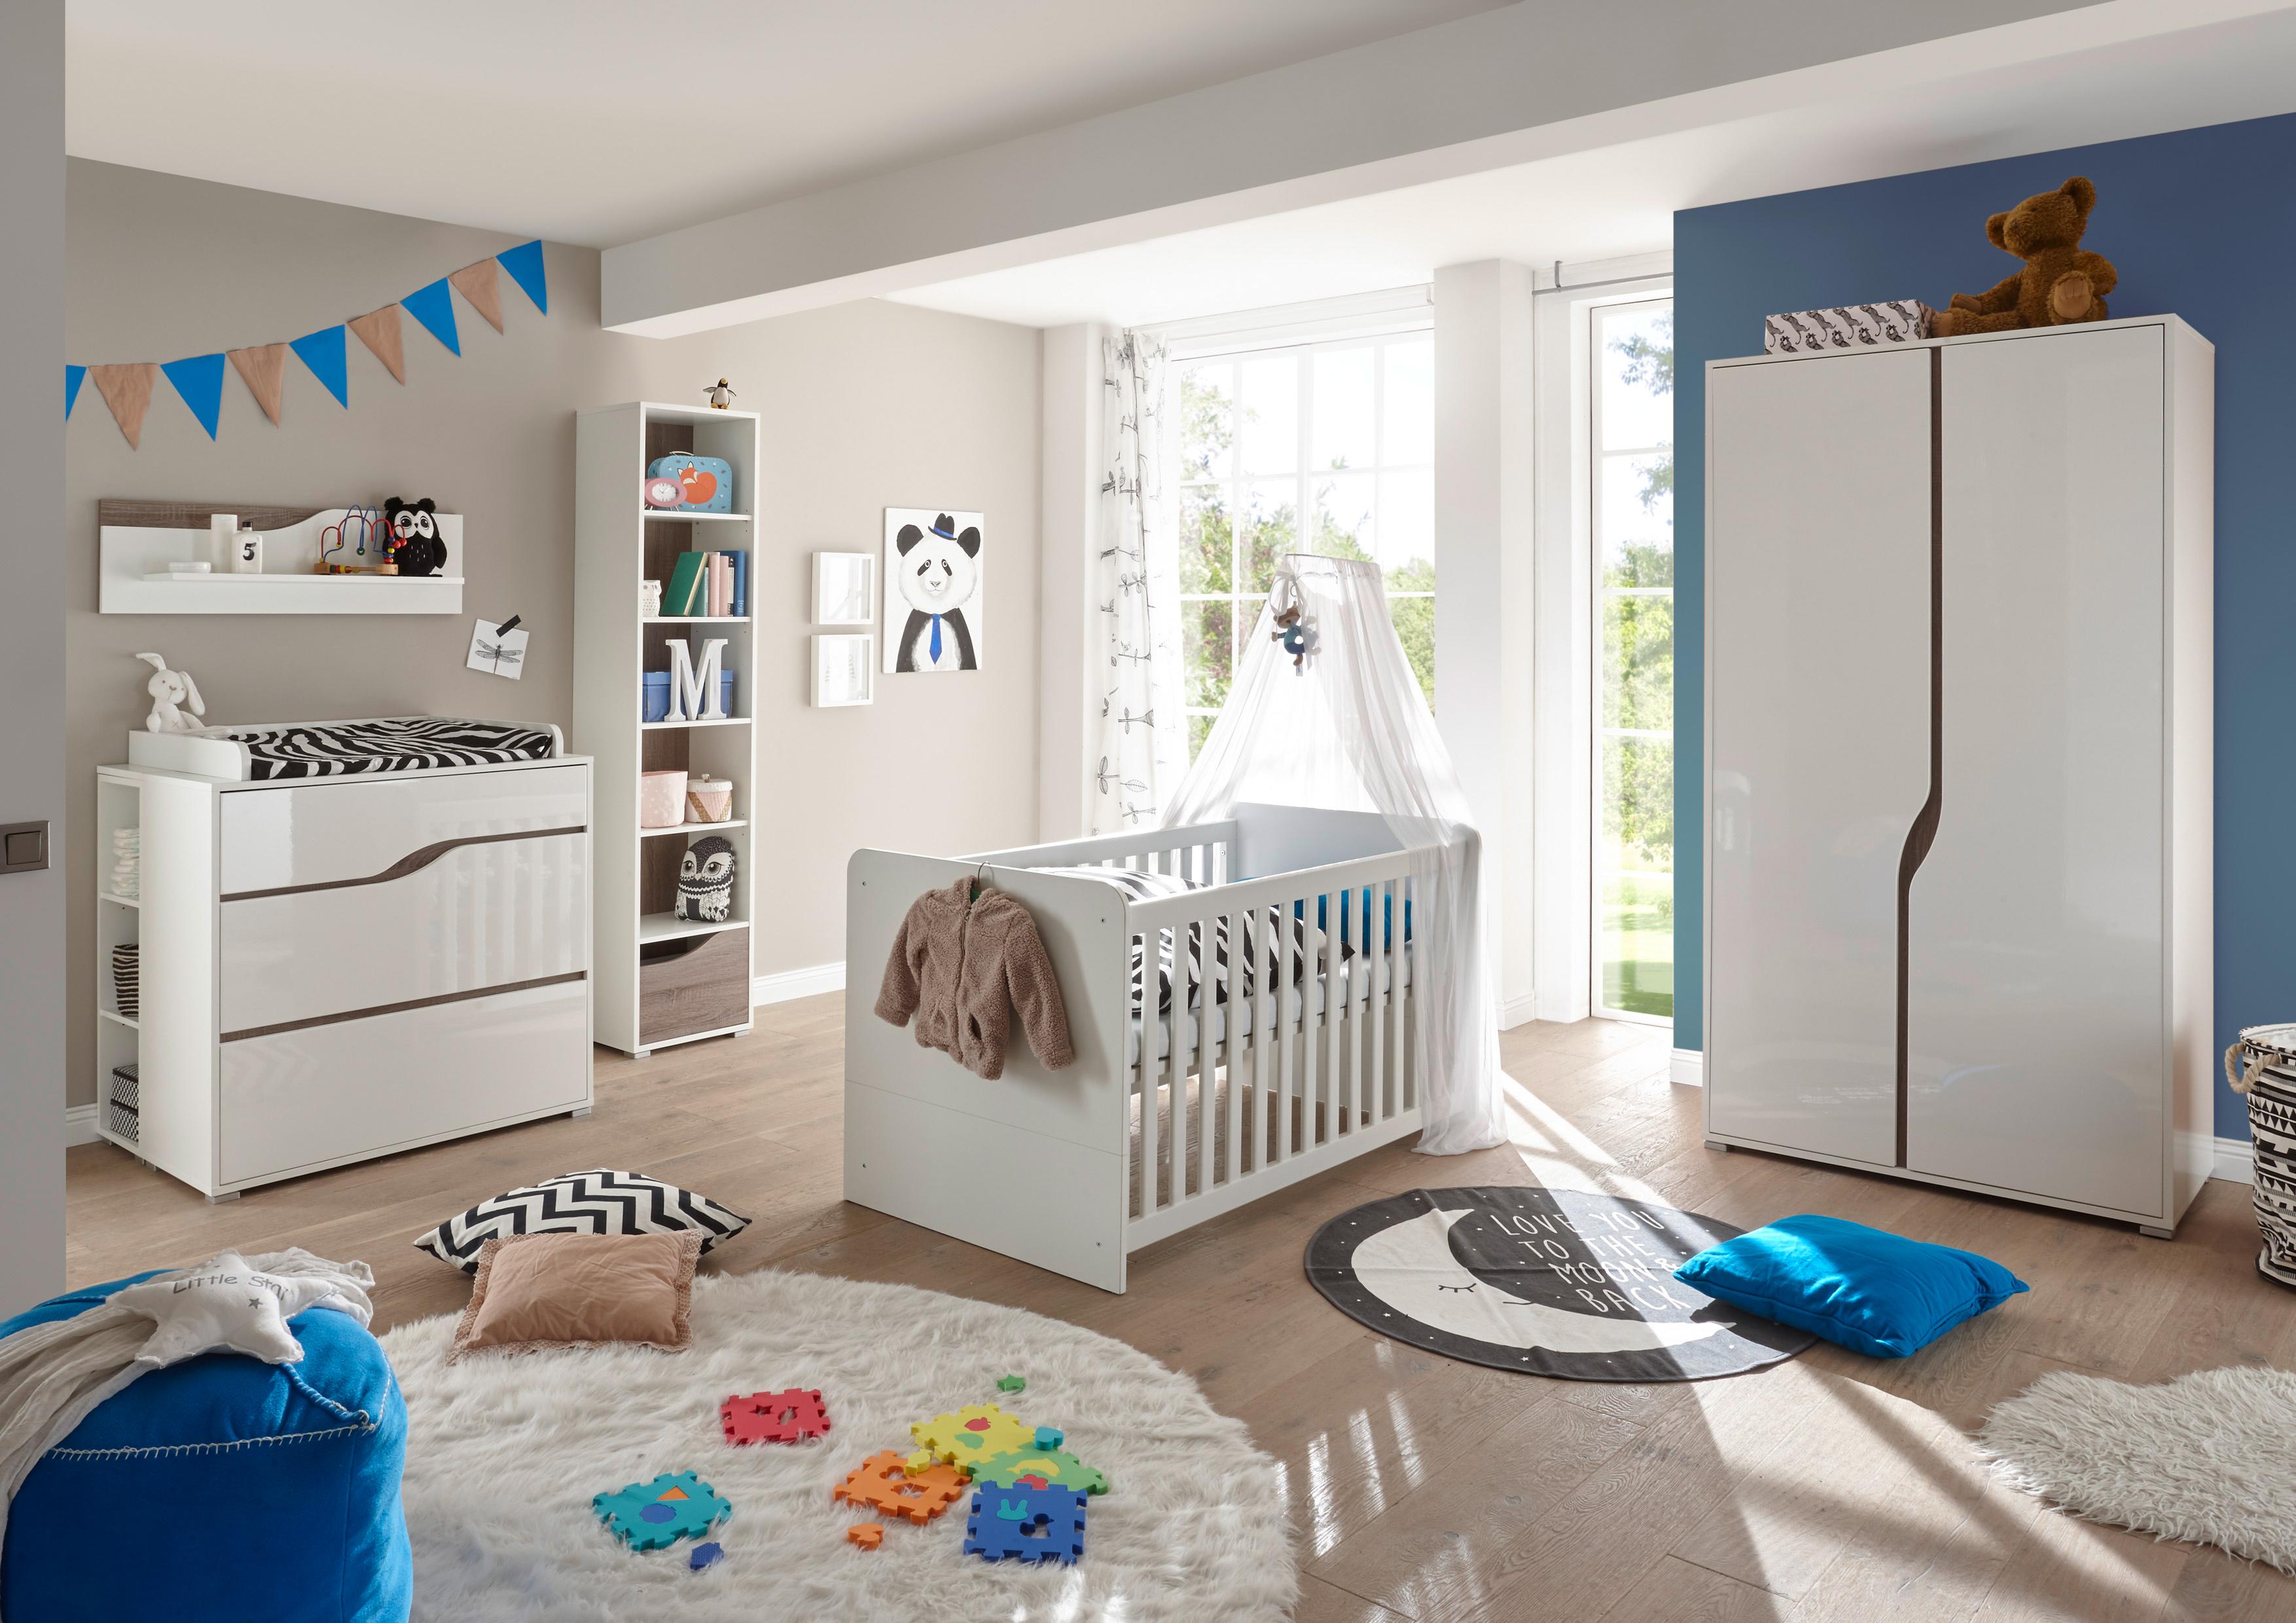 Babyzimmer Set Mara 5tlg Wickelkommode Bett Regal Schrank 2